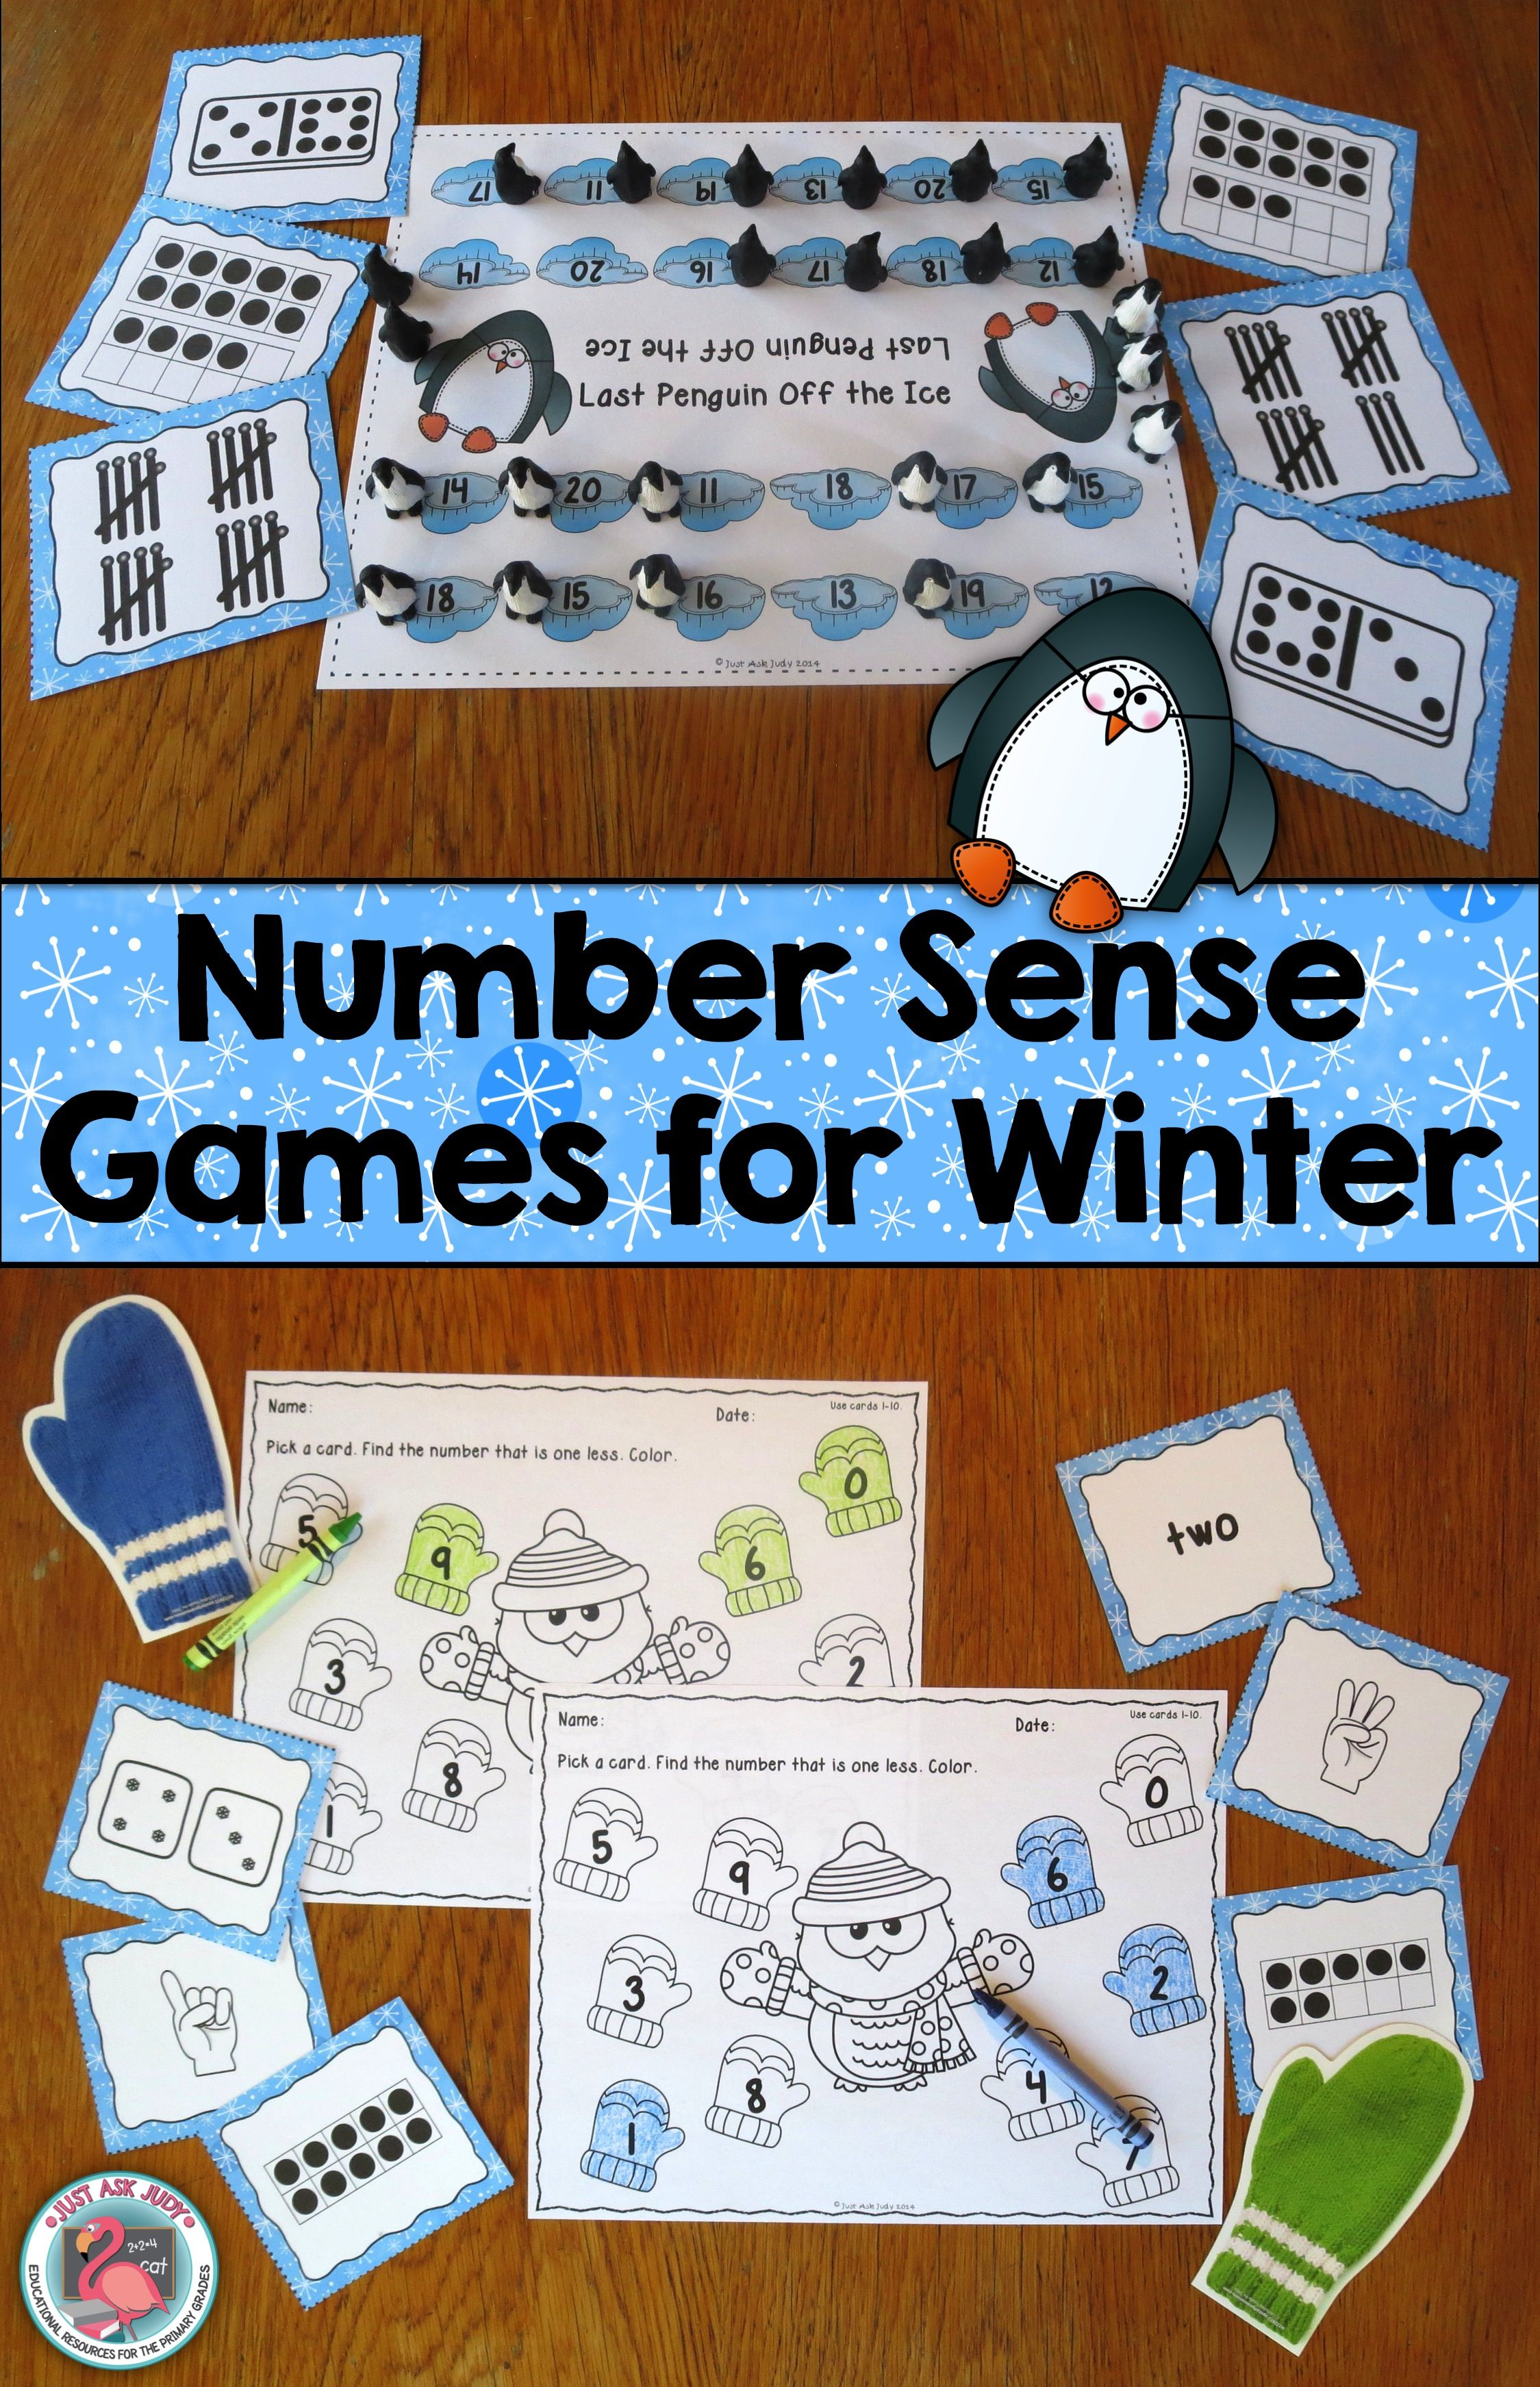 Number Sense Games Winter 0 5 0 10 11 20